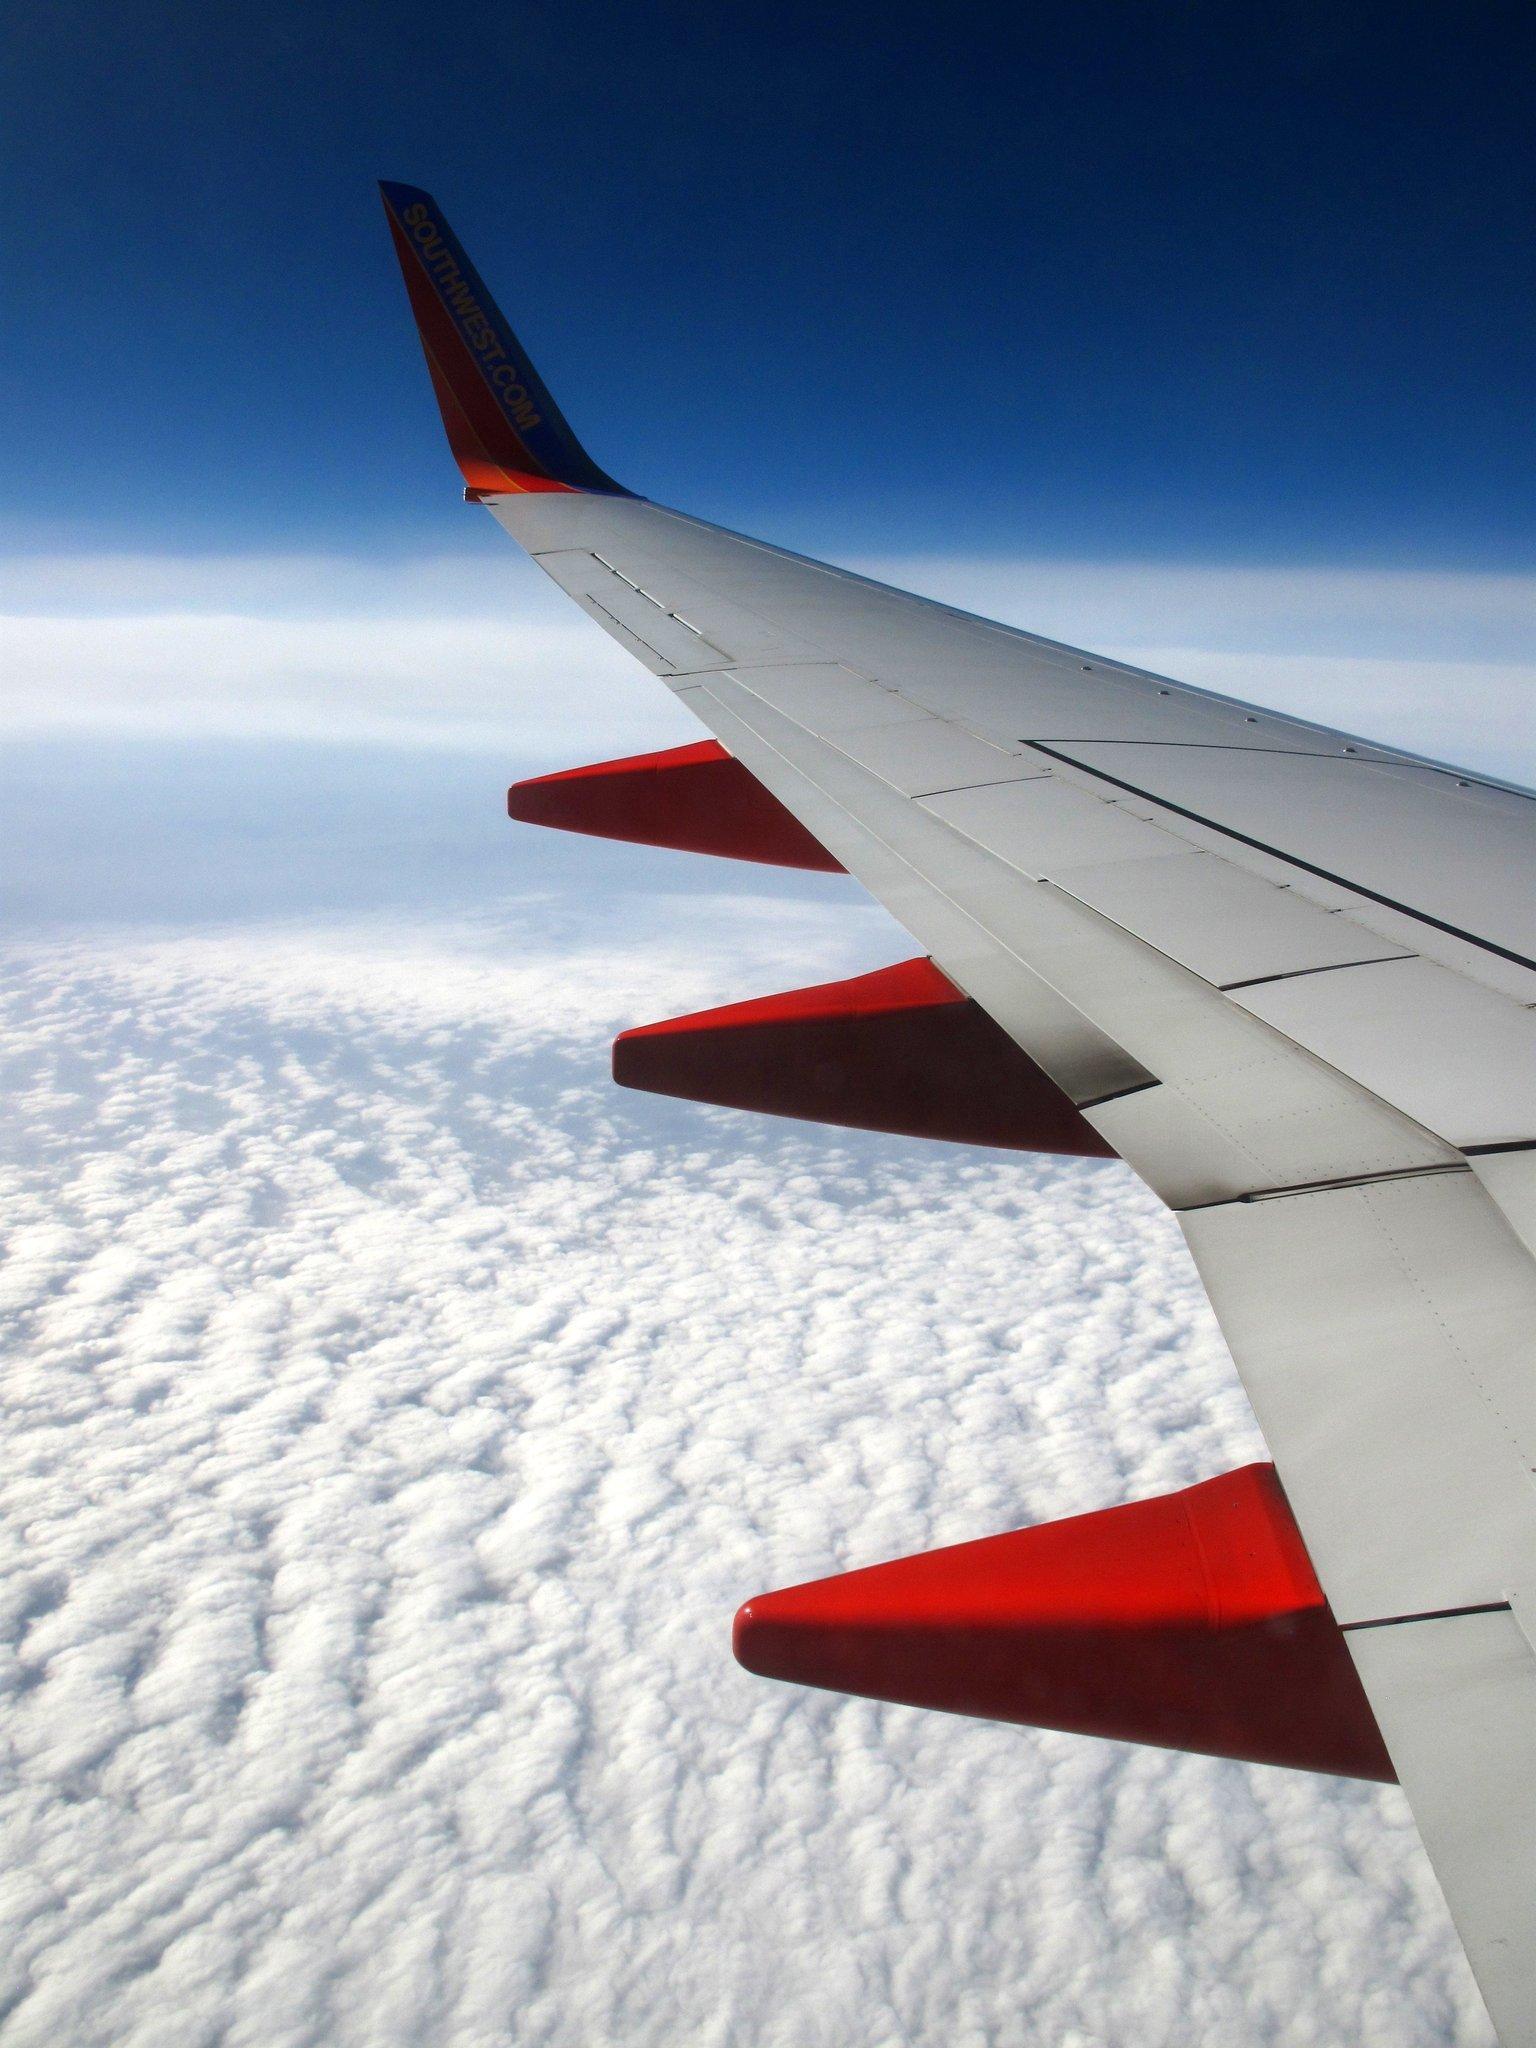 temebposubs.ga coupons and promo codes. Trust temebposubs.ga for Flights savings.